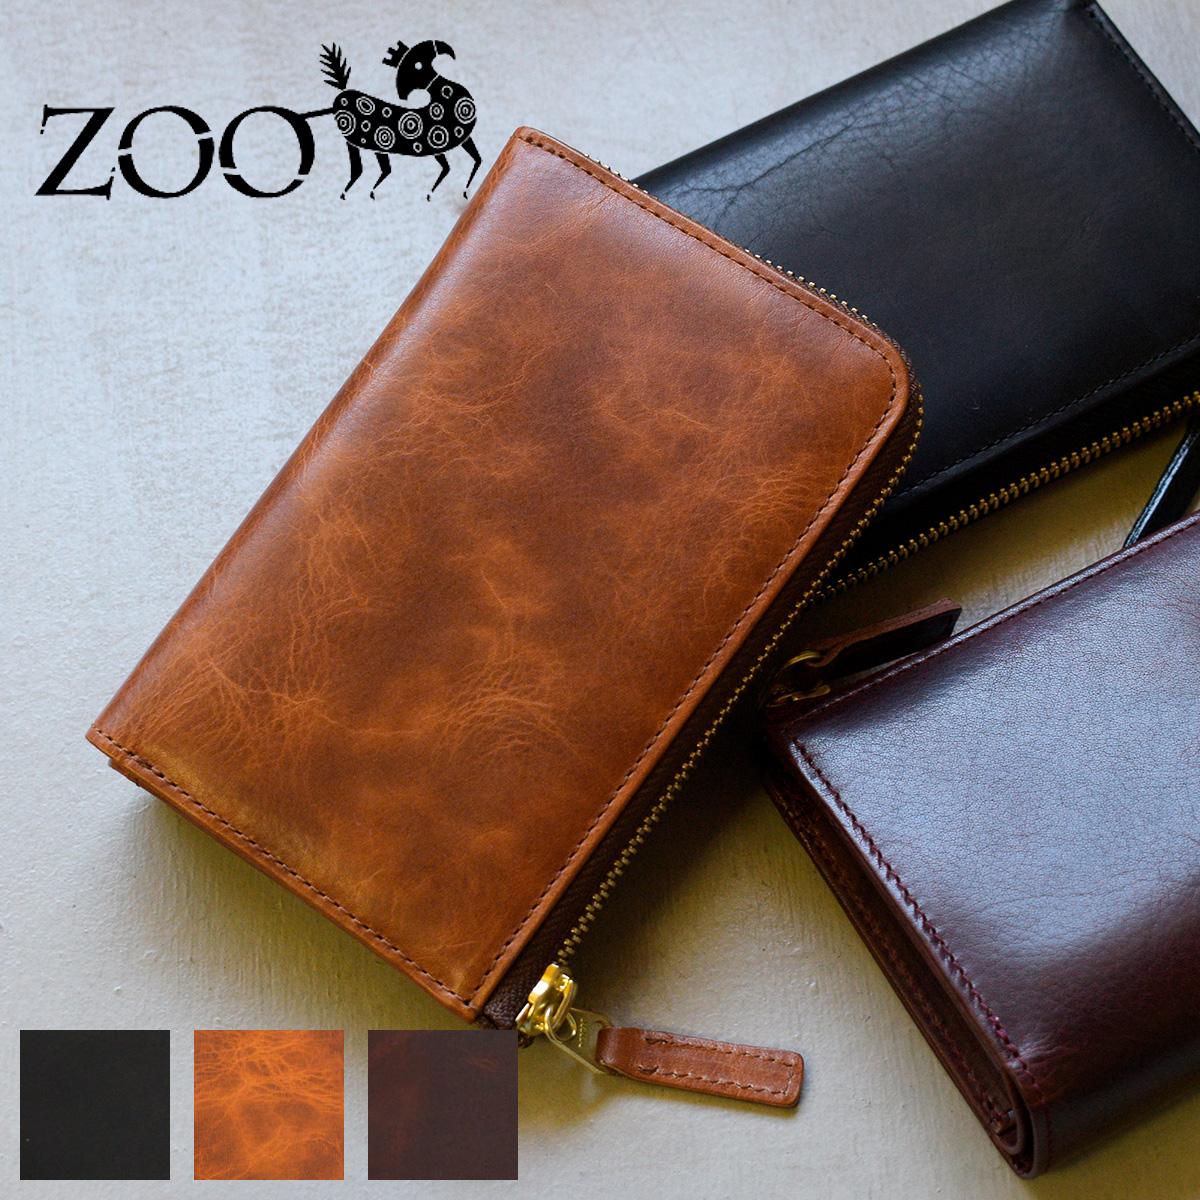 ZOO(ズー) オイルソフトレザー 牛革 メンズ L字ファスナー財布 二つ折り財布 イーグルミディアムウォレット zmw-001